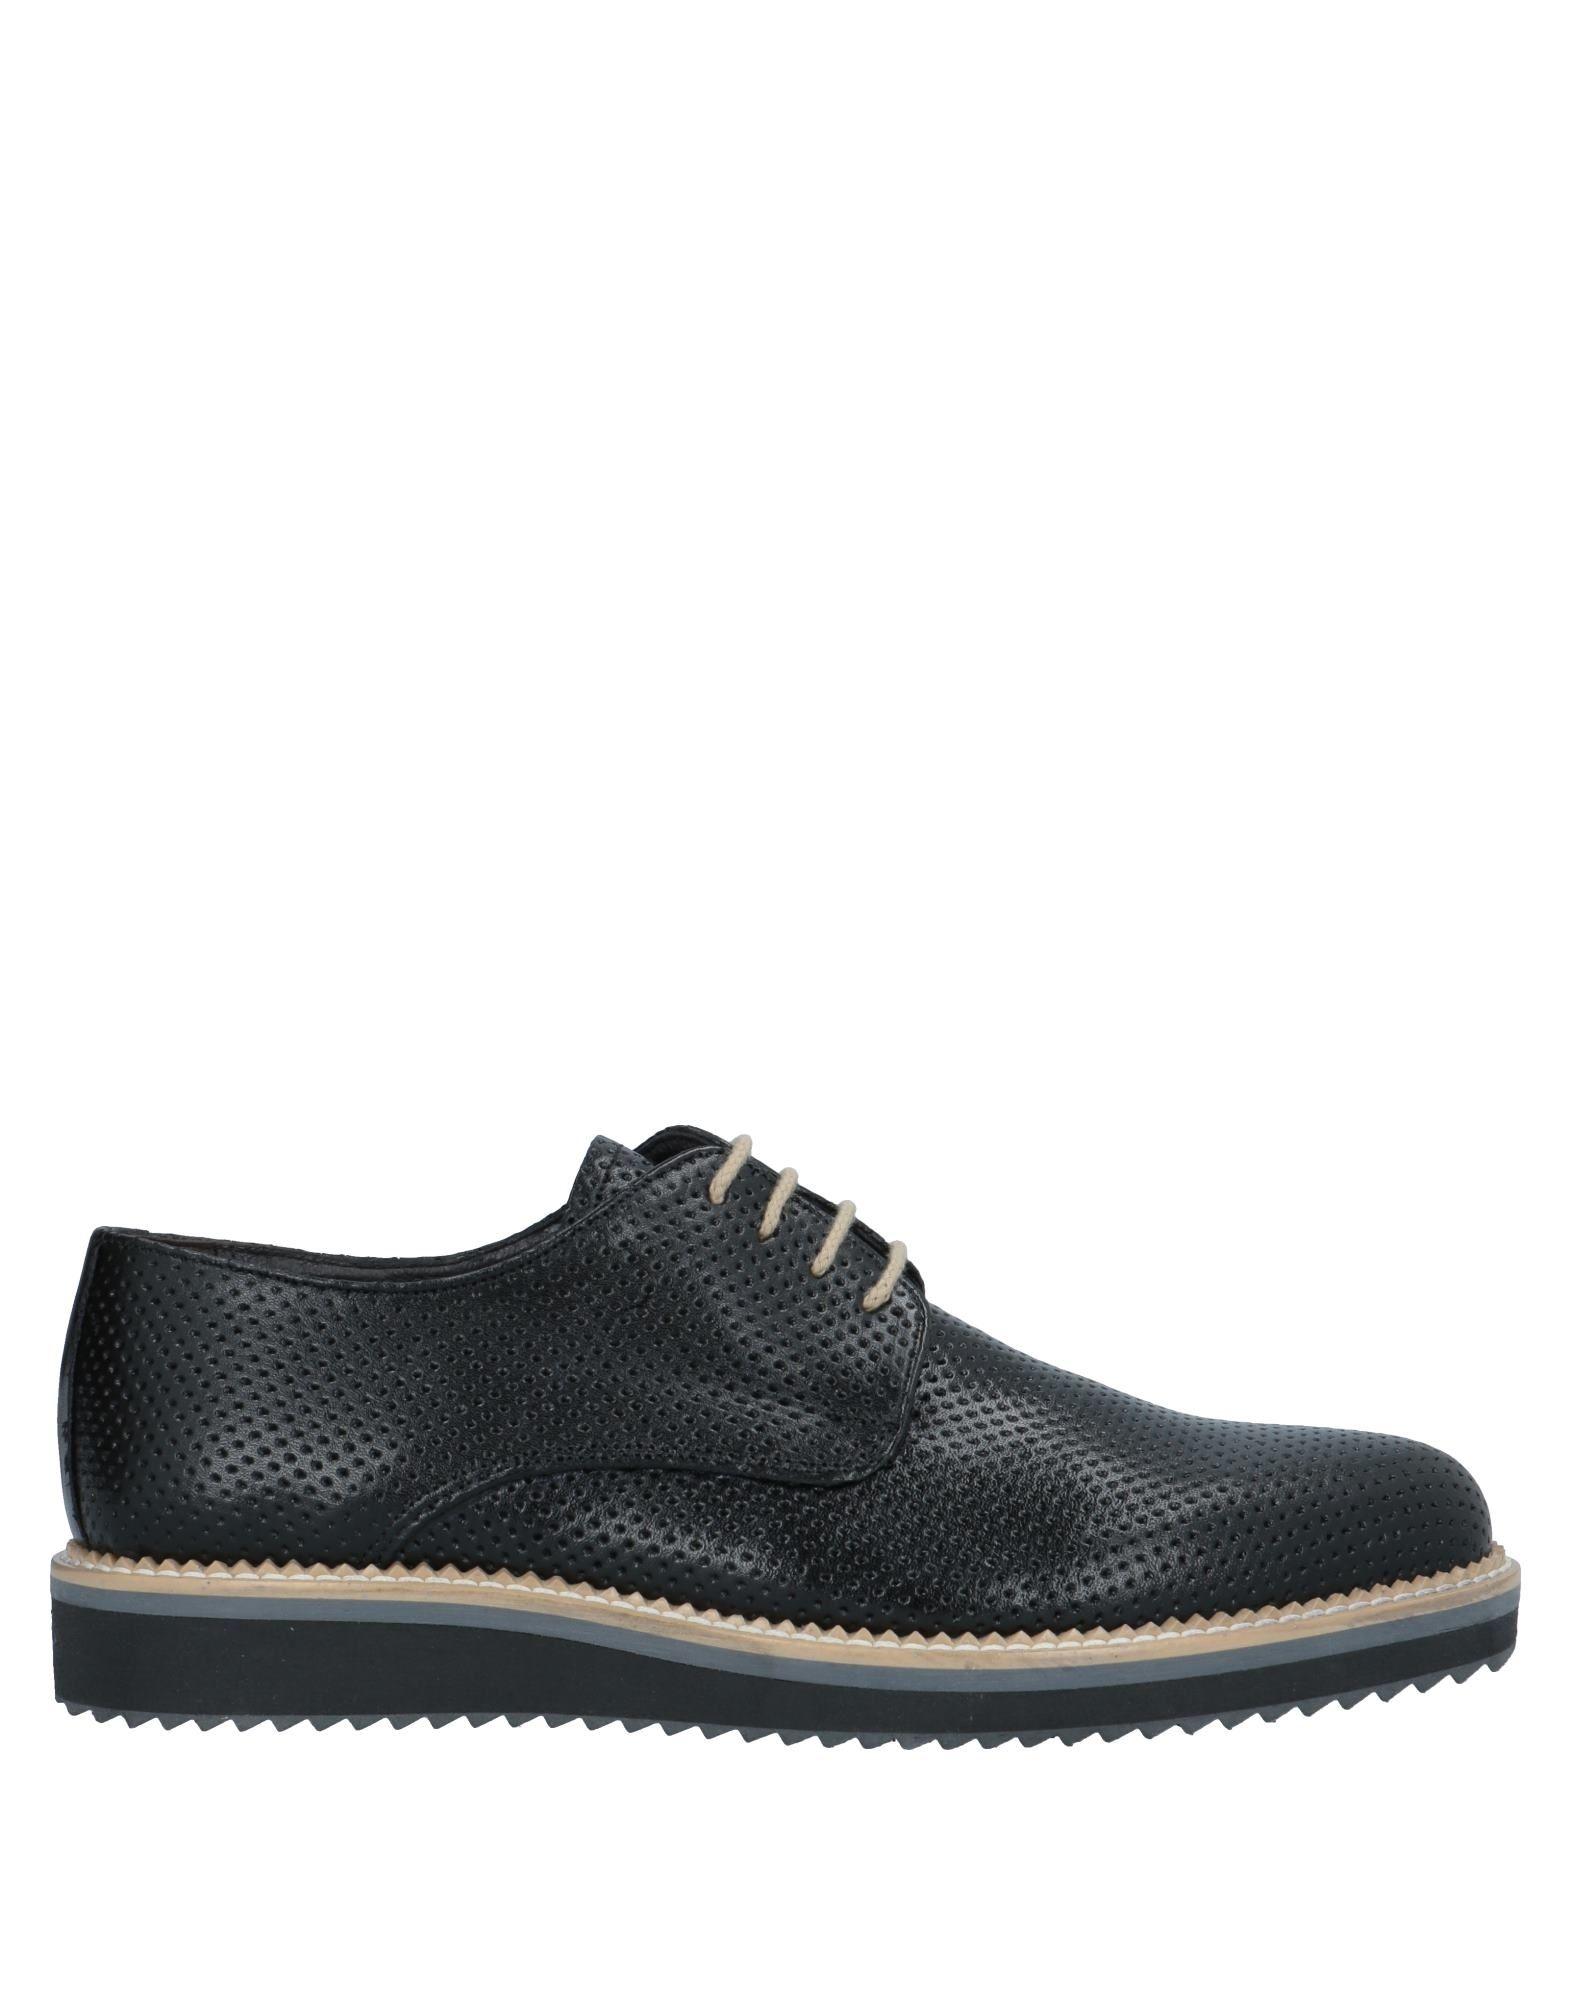 BRAWN'S Обувь на шнурках обувь 2015 тренды